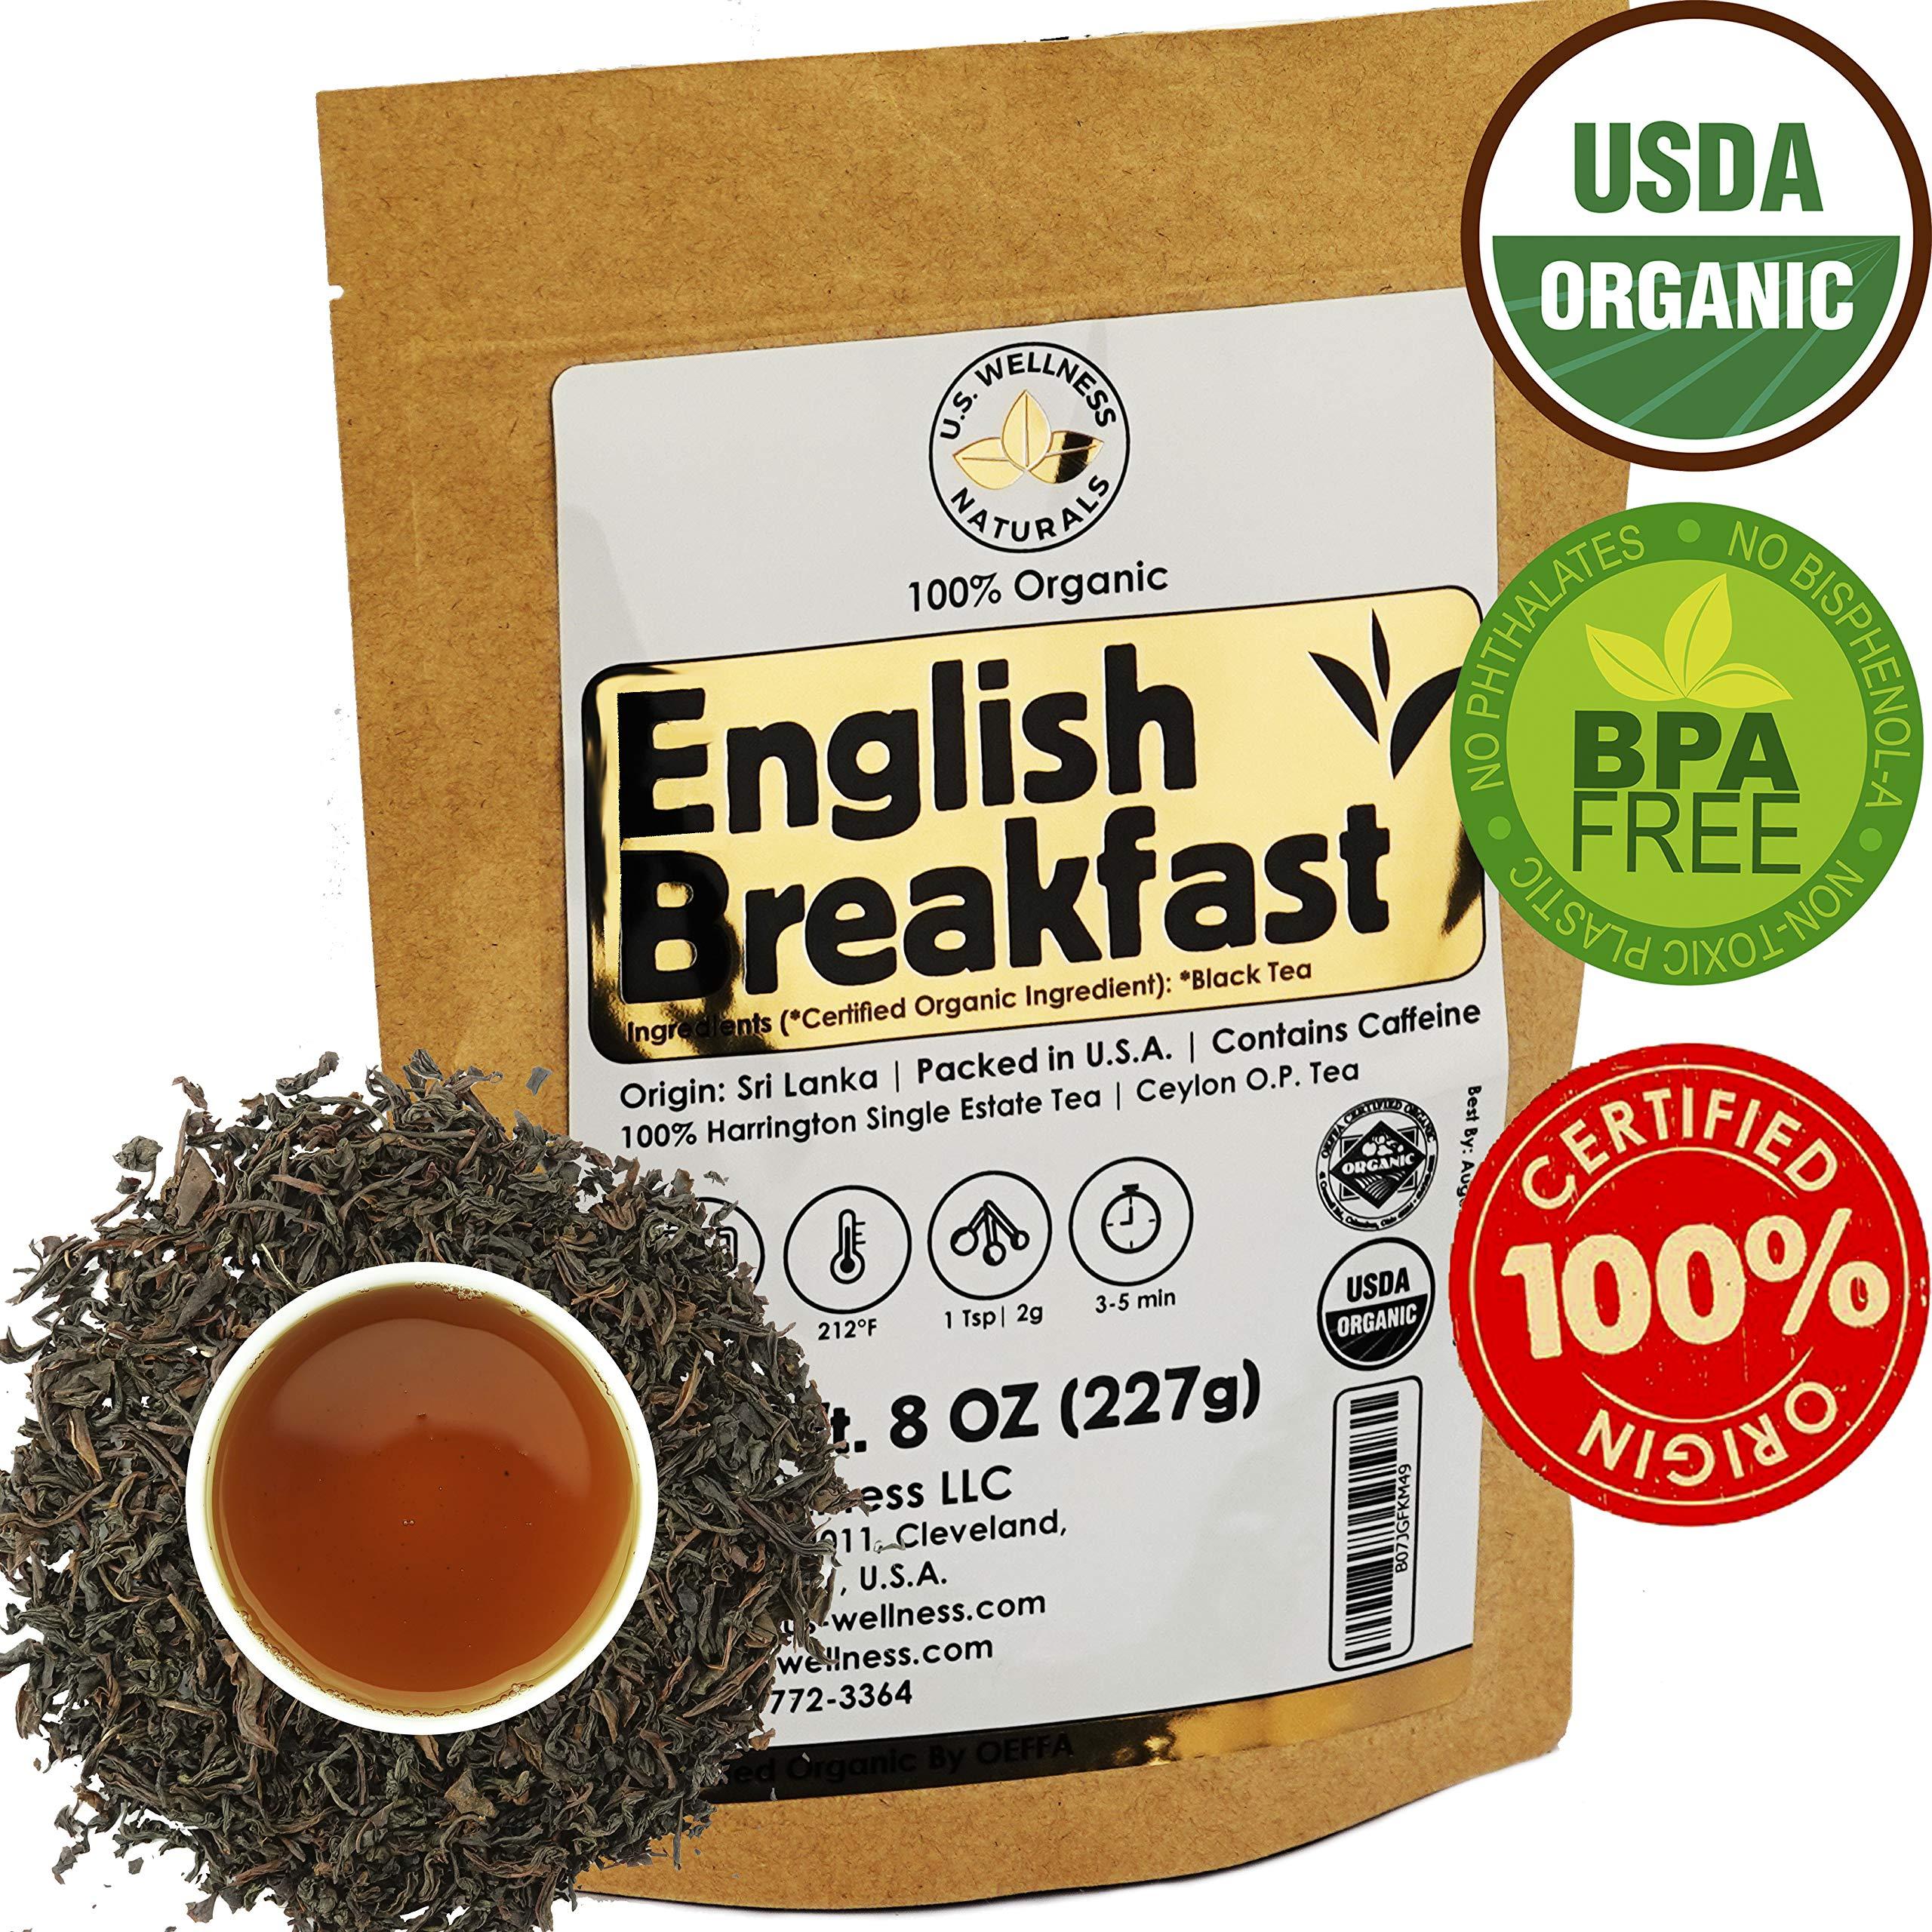 English Breakfast Tea, CRISP, RICH & AROMATIC well-rounded loose leaf tea, 110+ cups, 8oz Organic Ceylon SINGLE ESTATE tea, 100% Harrington estate, OP grade tea, U.S.A. Processed & Quality Control by U.S. Wellness Naturals